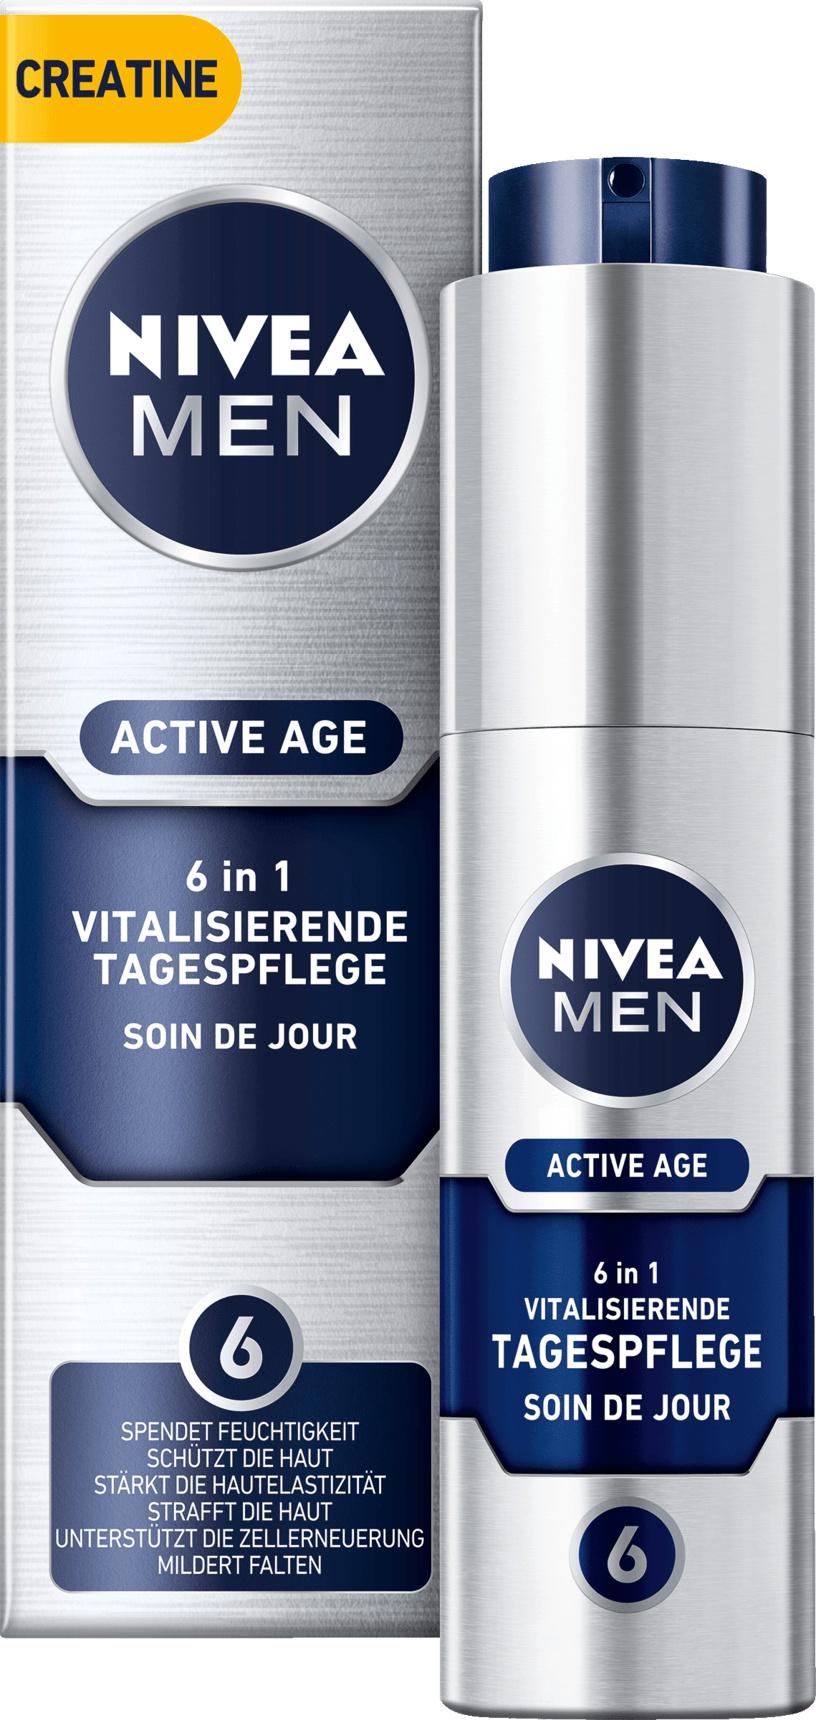 Nivea Men Active Age 6 In 1 Vitalisierende Tagespflege